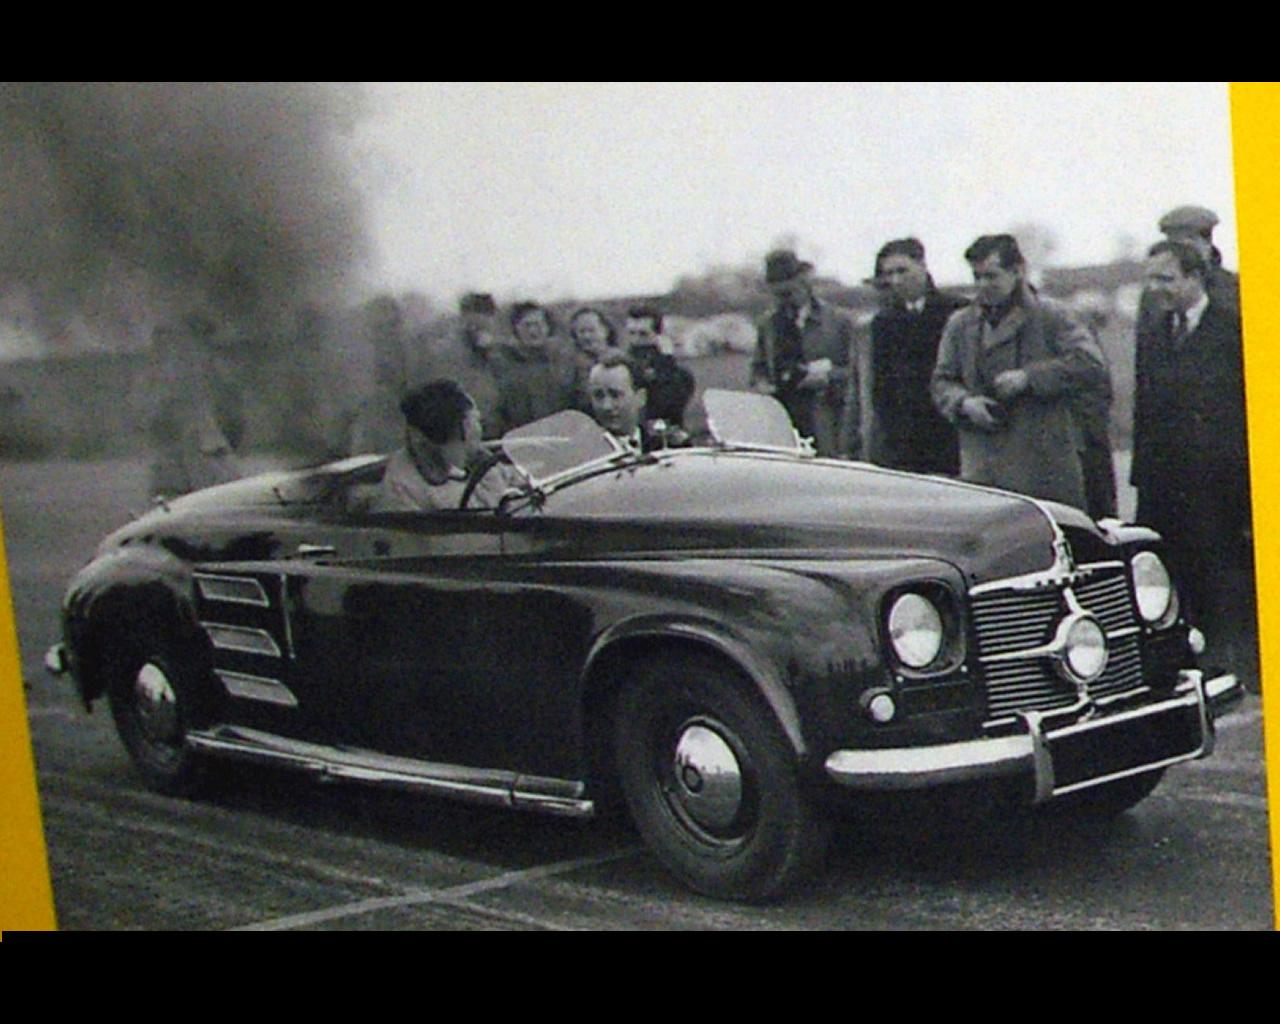 http://www.autoconcept-reviews.com/cars_reviews/rover/rover-jet-1-gas-turbine-1950/wallpapers/rover-jet-1-gas-turbine-1950-2.jpg